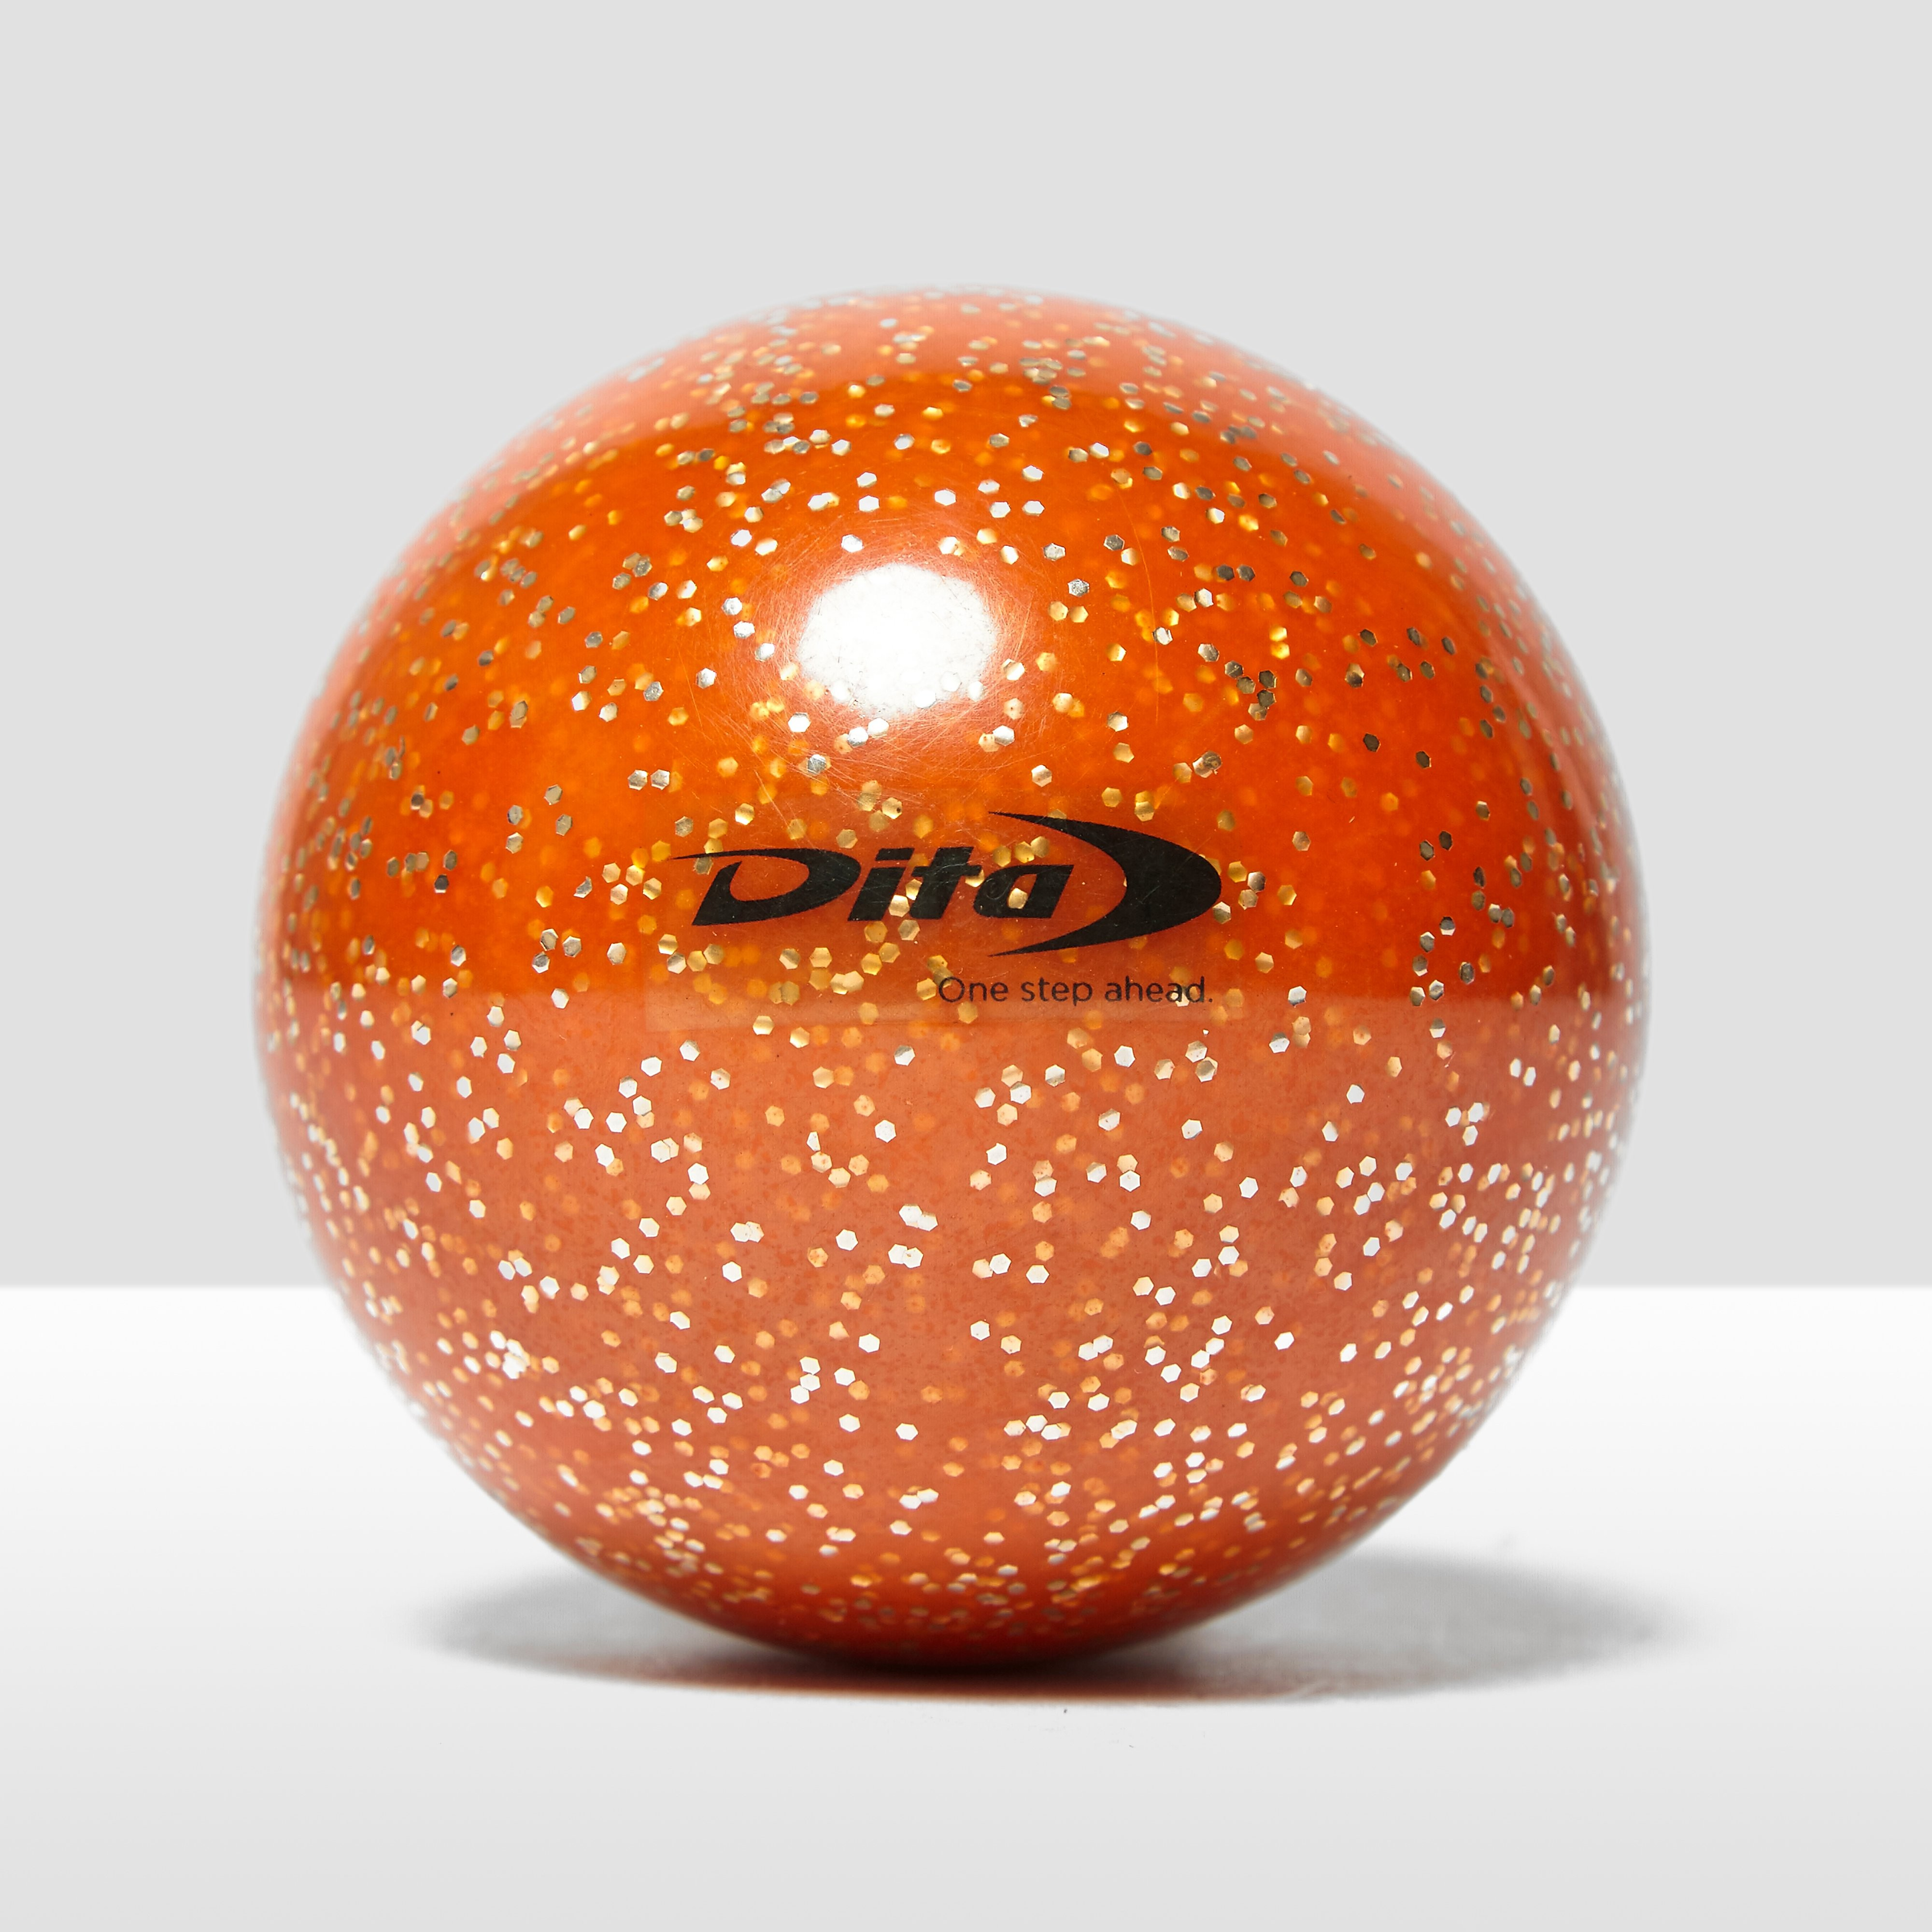 Dita Glitter Ball in Blister Hockey Ball